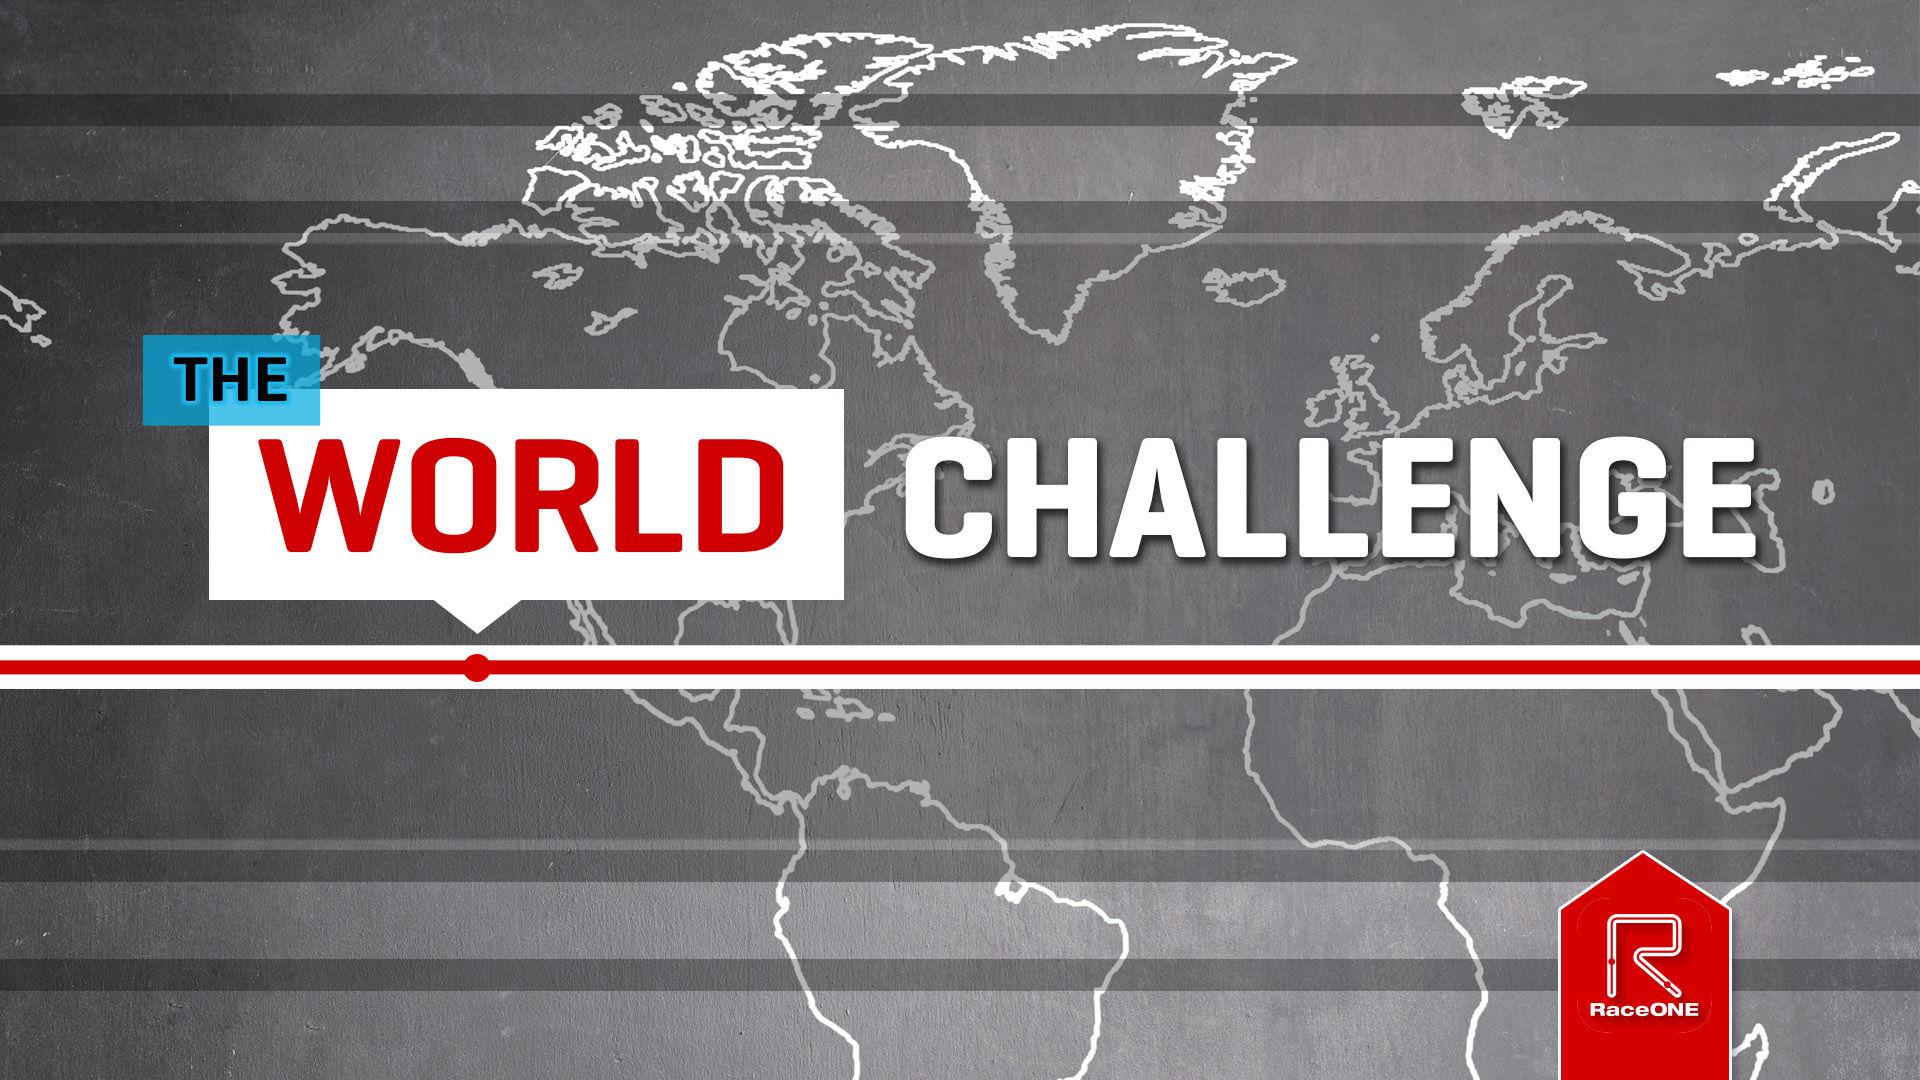 The World Challenge